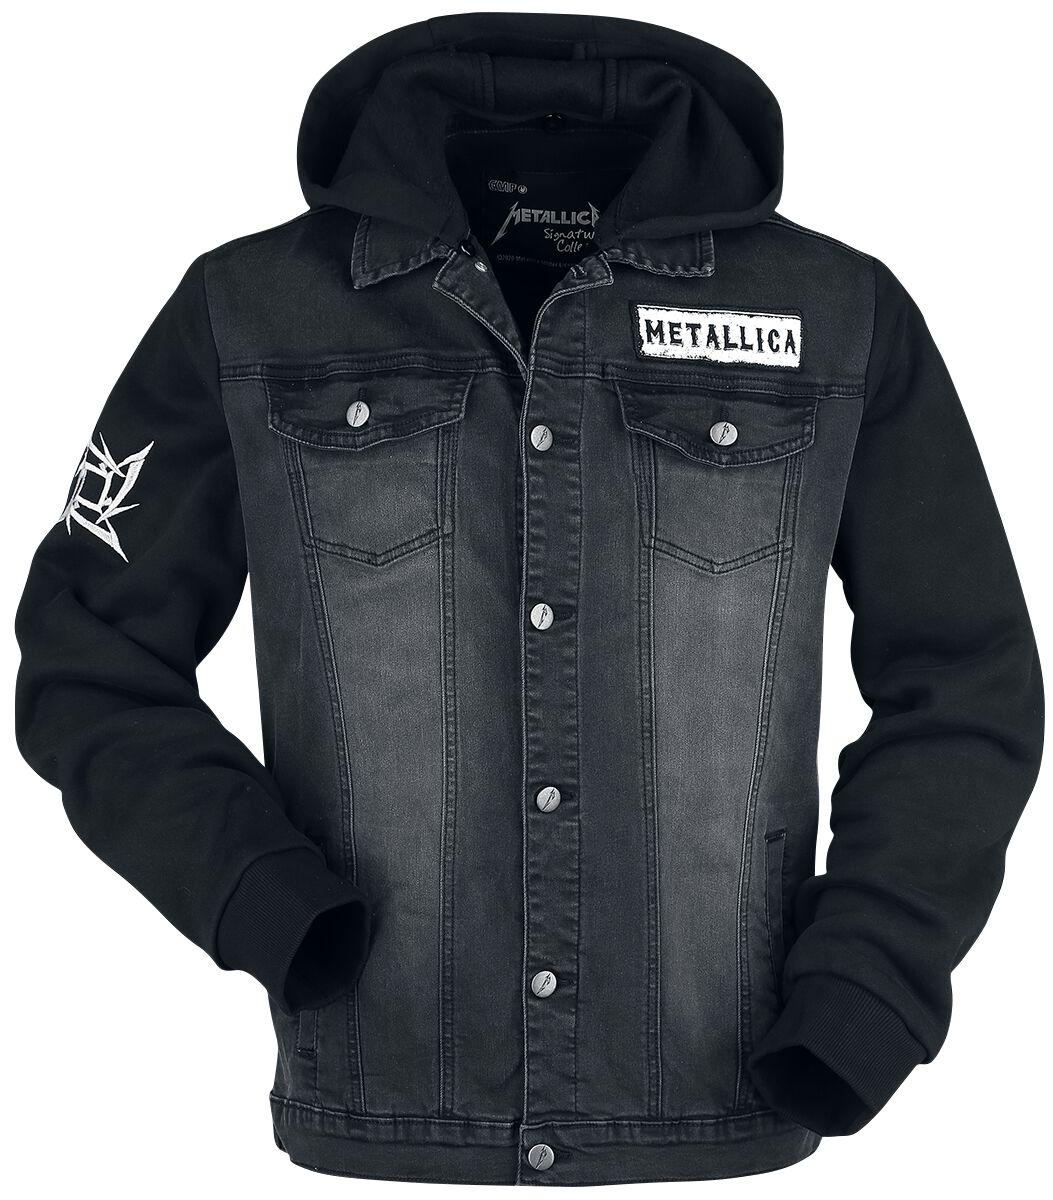 Metallica EMP Signature Collection Jeans Jacket dark grey black